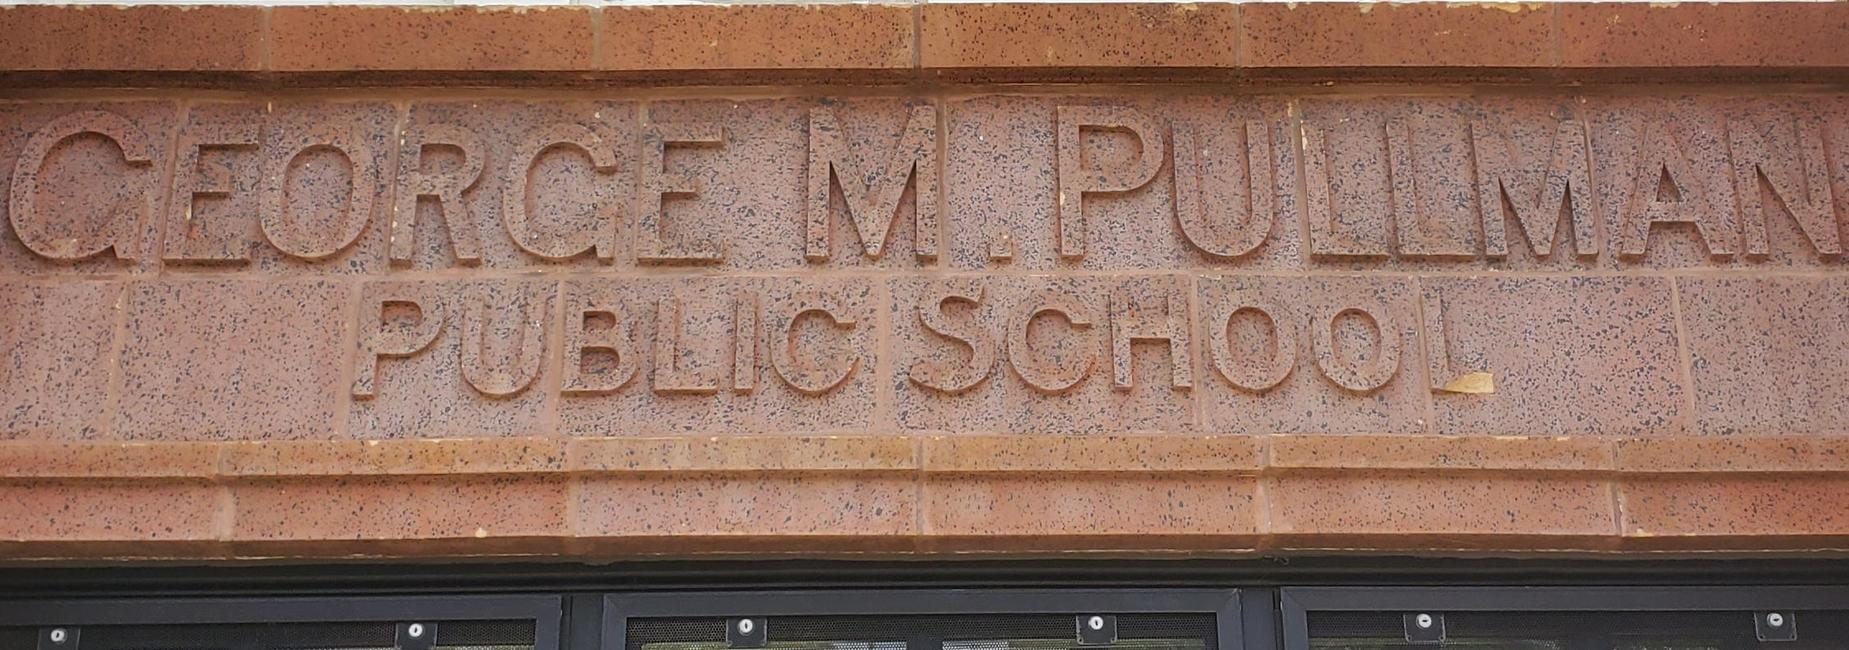 Pullman Elementary